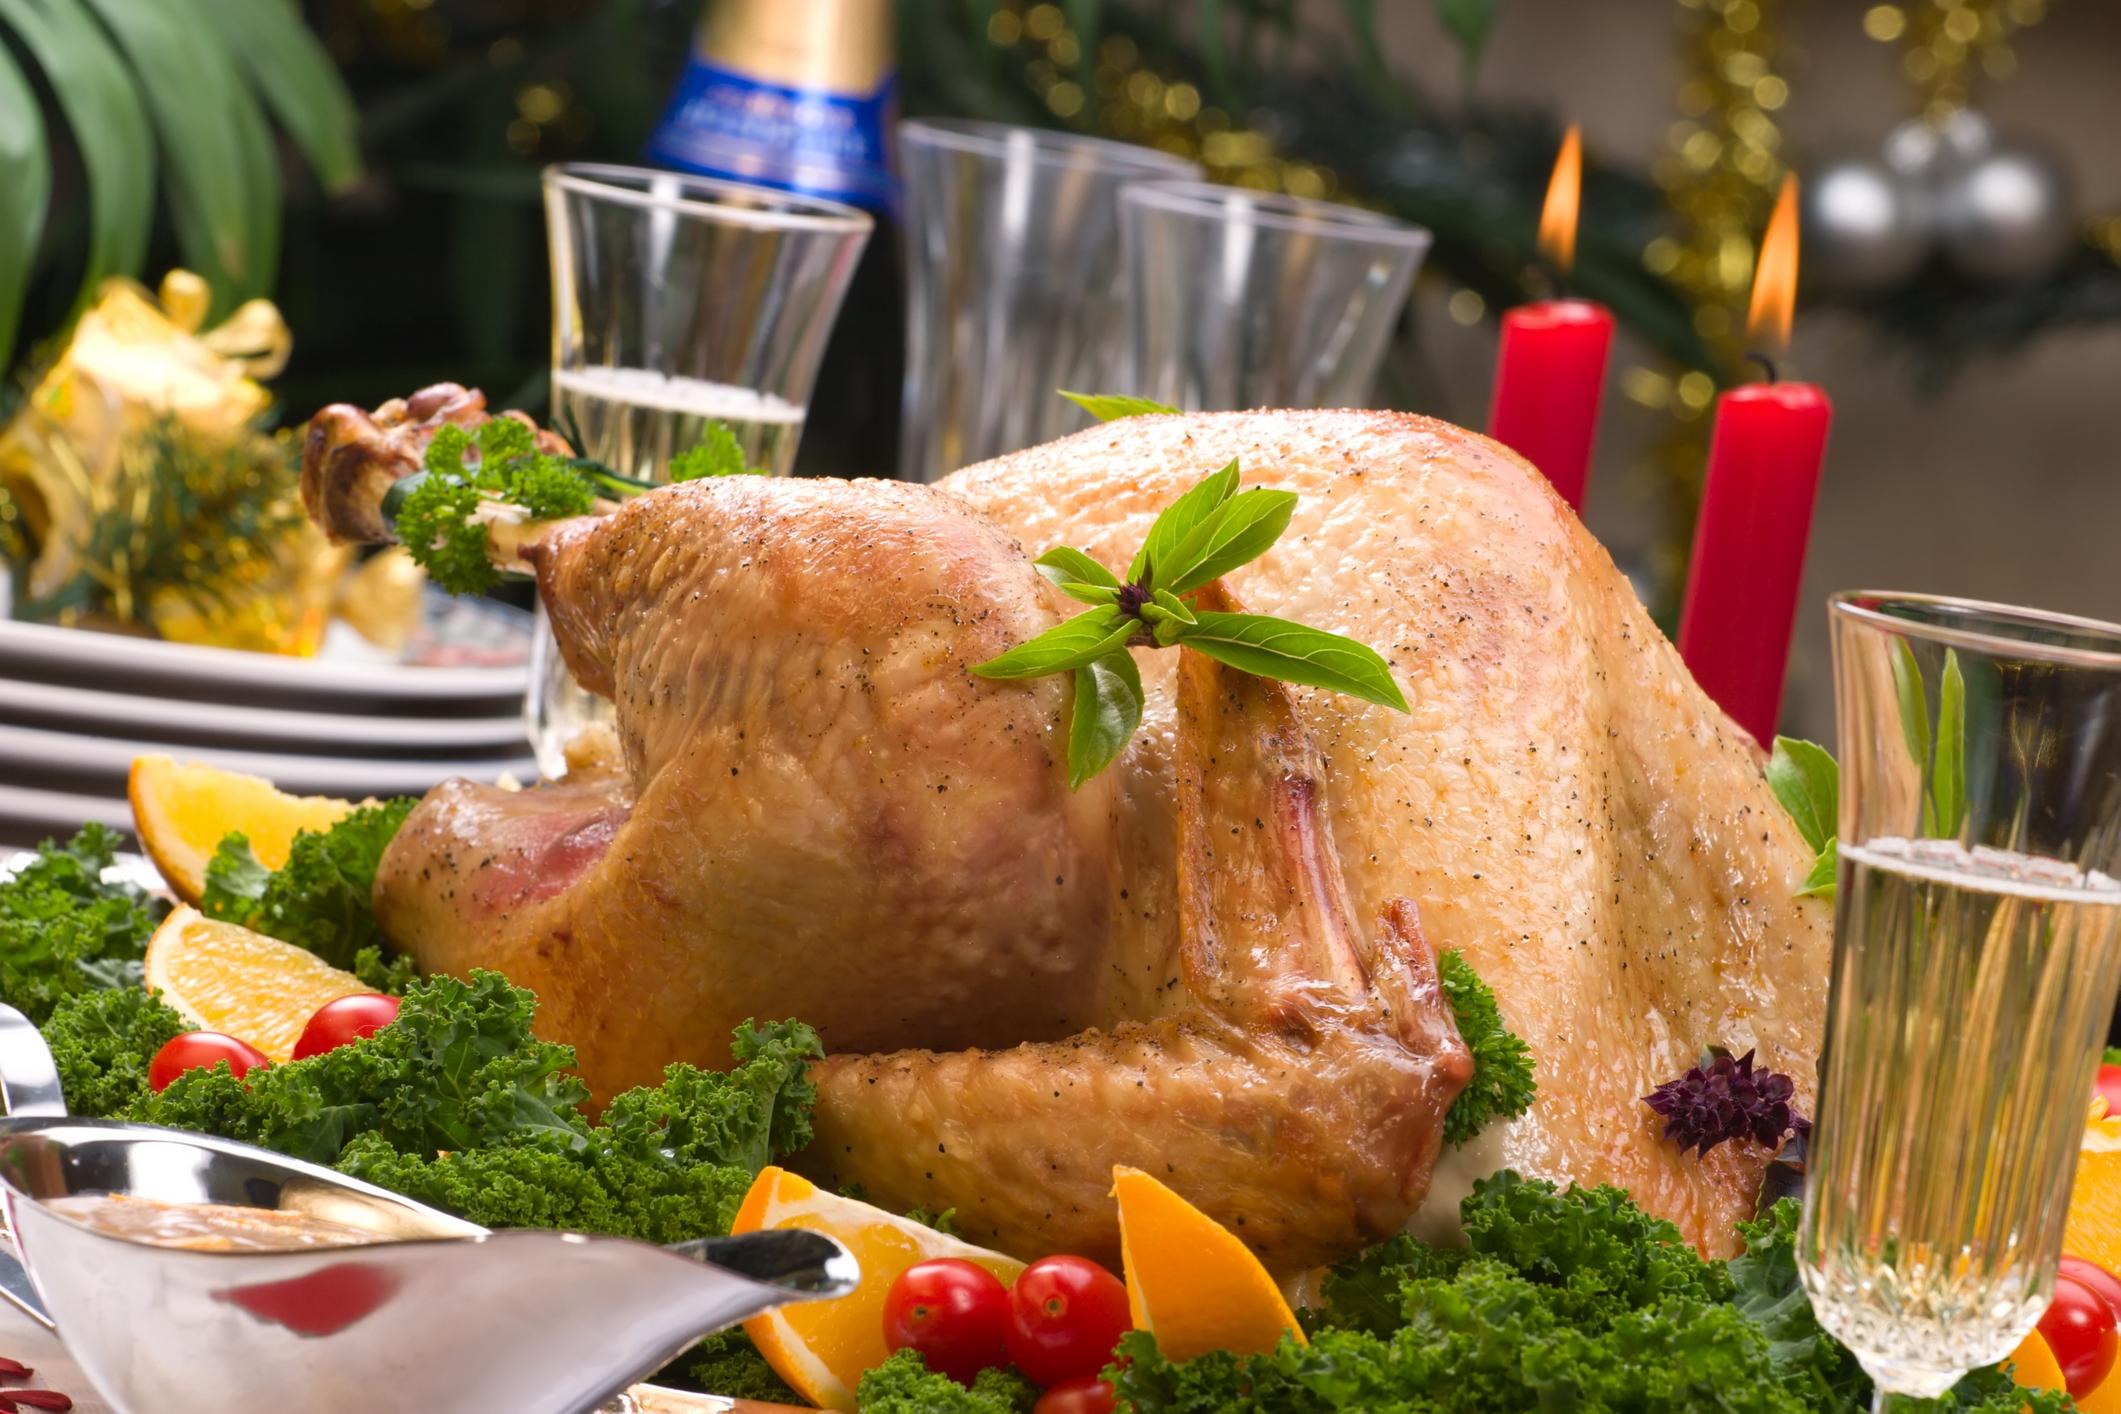 Where to buy Christmas turkeys